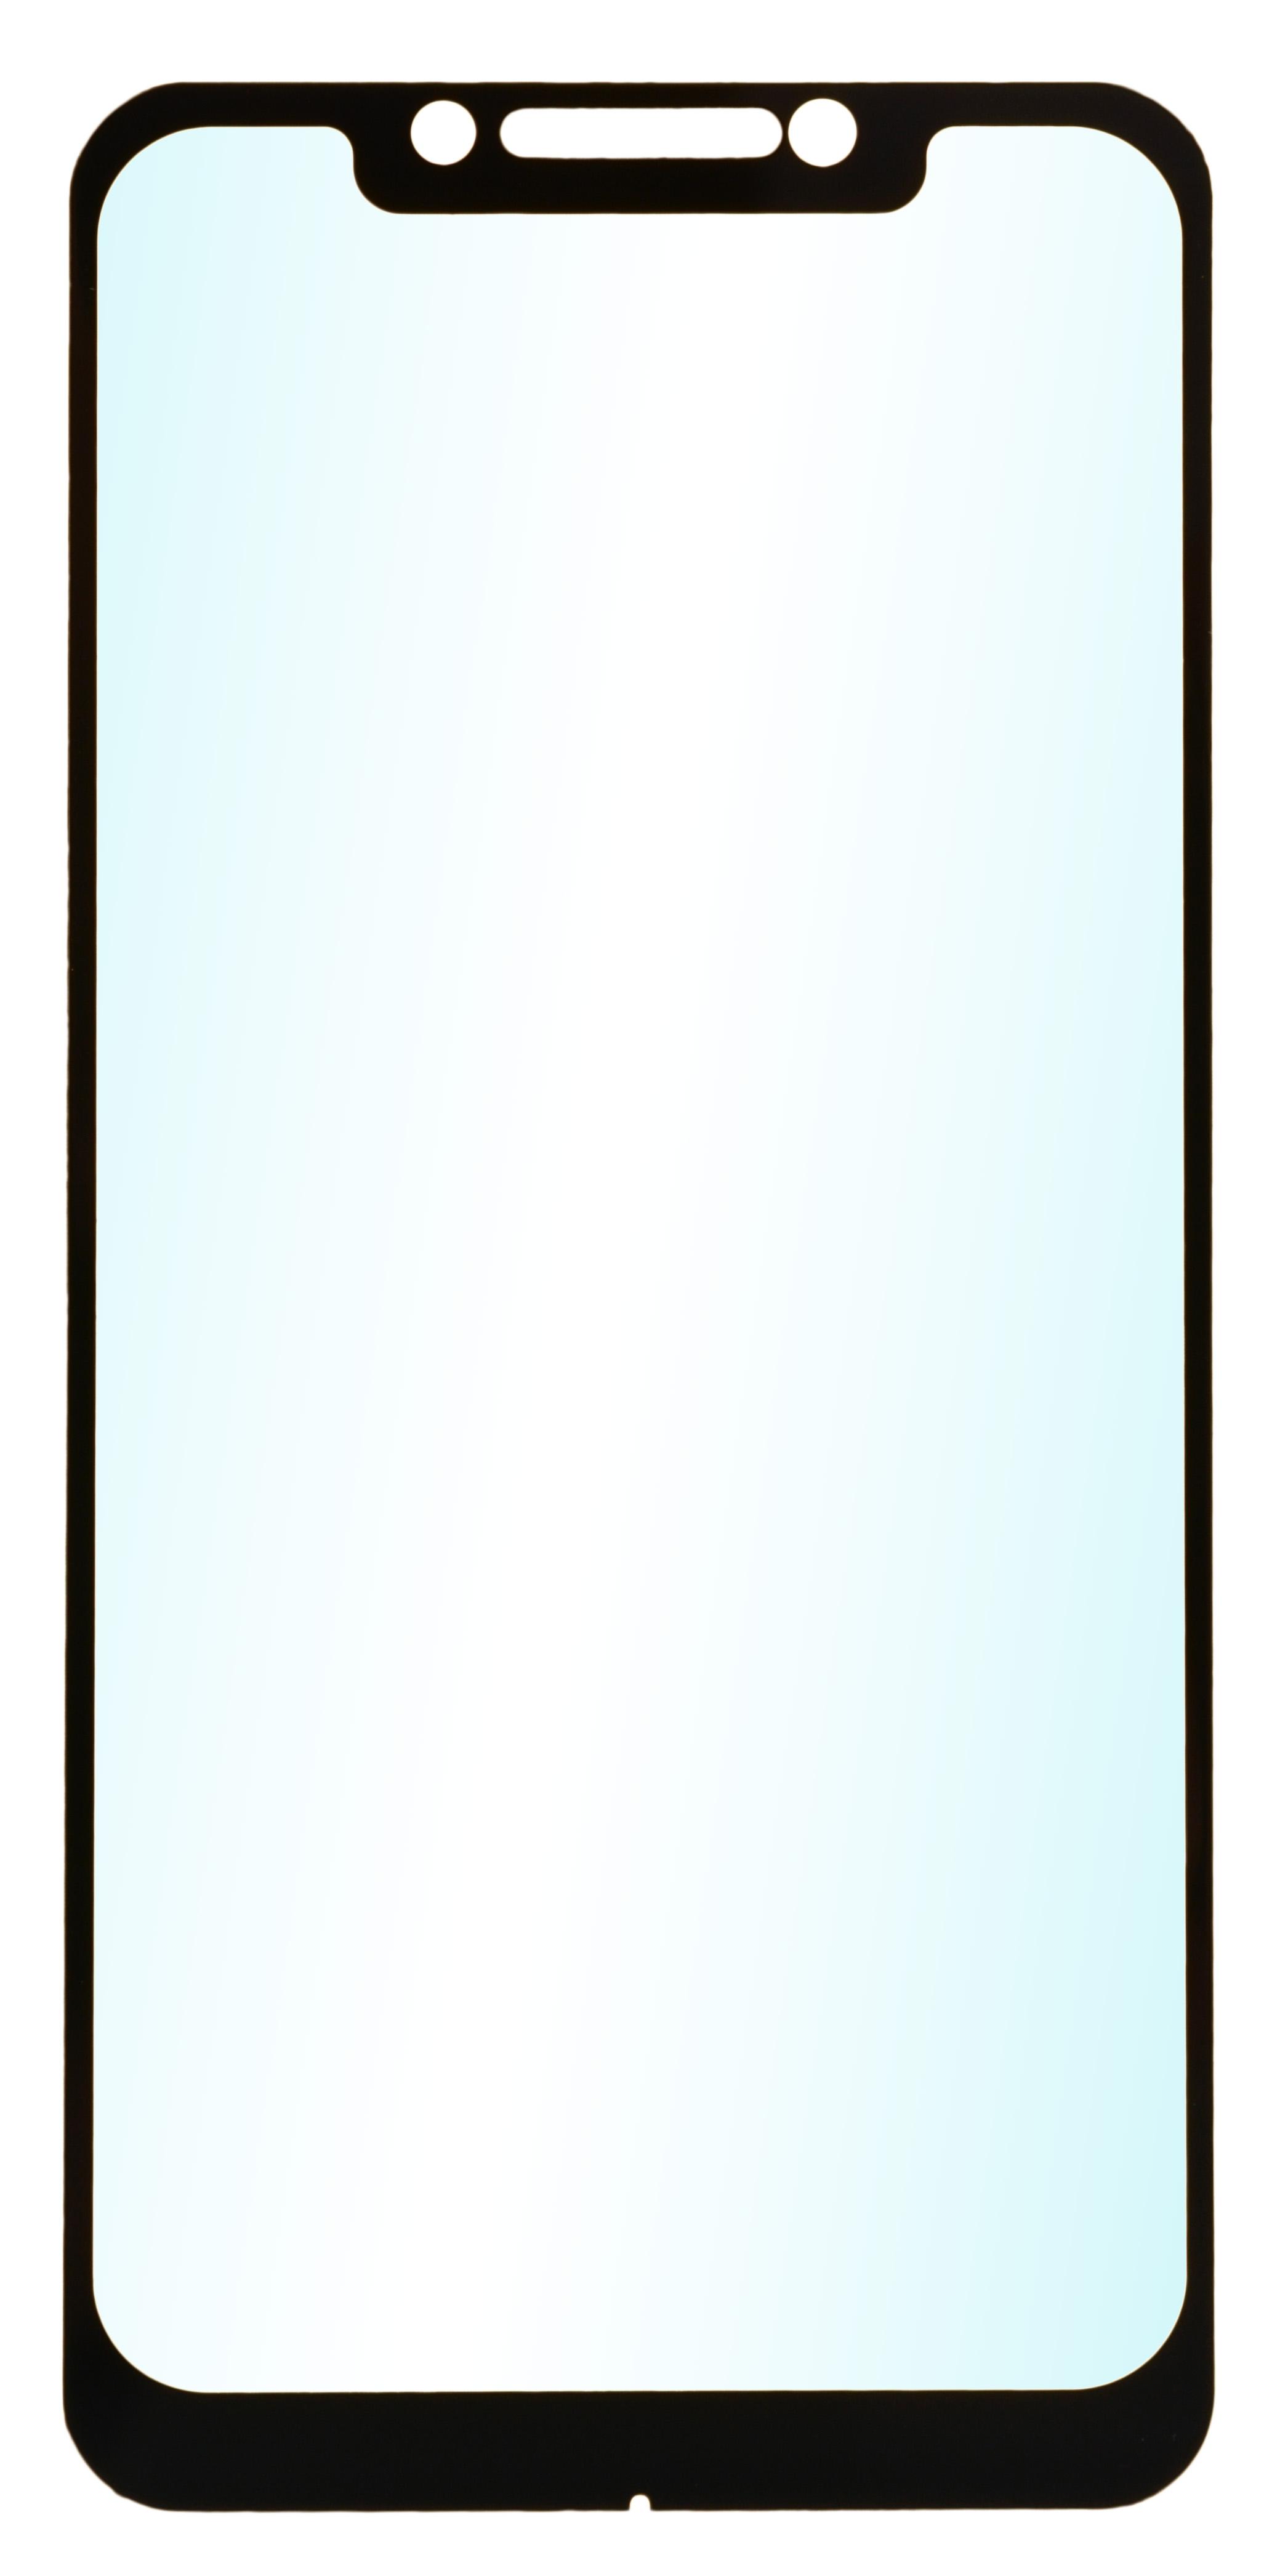 Защитное стекло skinBOX full screen, 4630042522770, черный защитное стекло skinbox full screen 4630042522817 черный